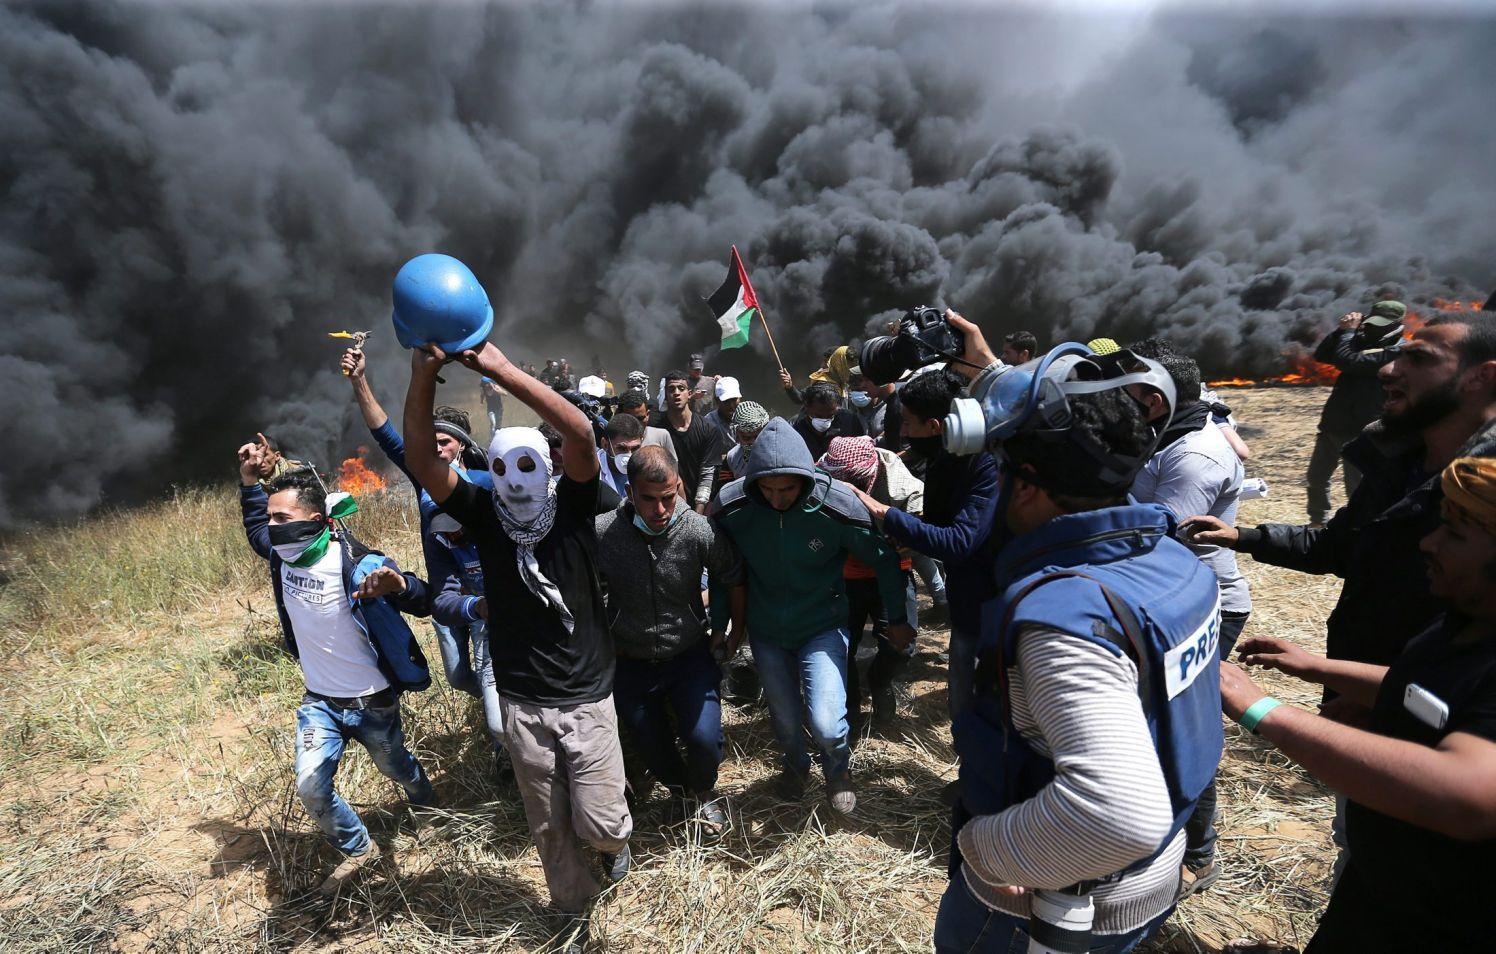 Palestinians evacuate mortally wounded Palestinian journalist Yasser Murtaja, 31, during clashes with Israeli troops at the Israel-Gaza border\ IBRAHEEM ABU MUSTAFA/ REUTERS